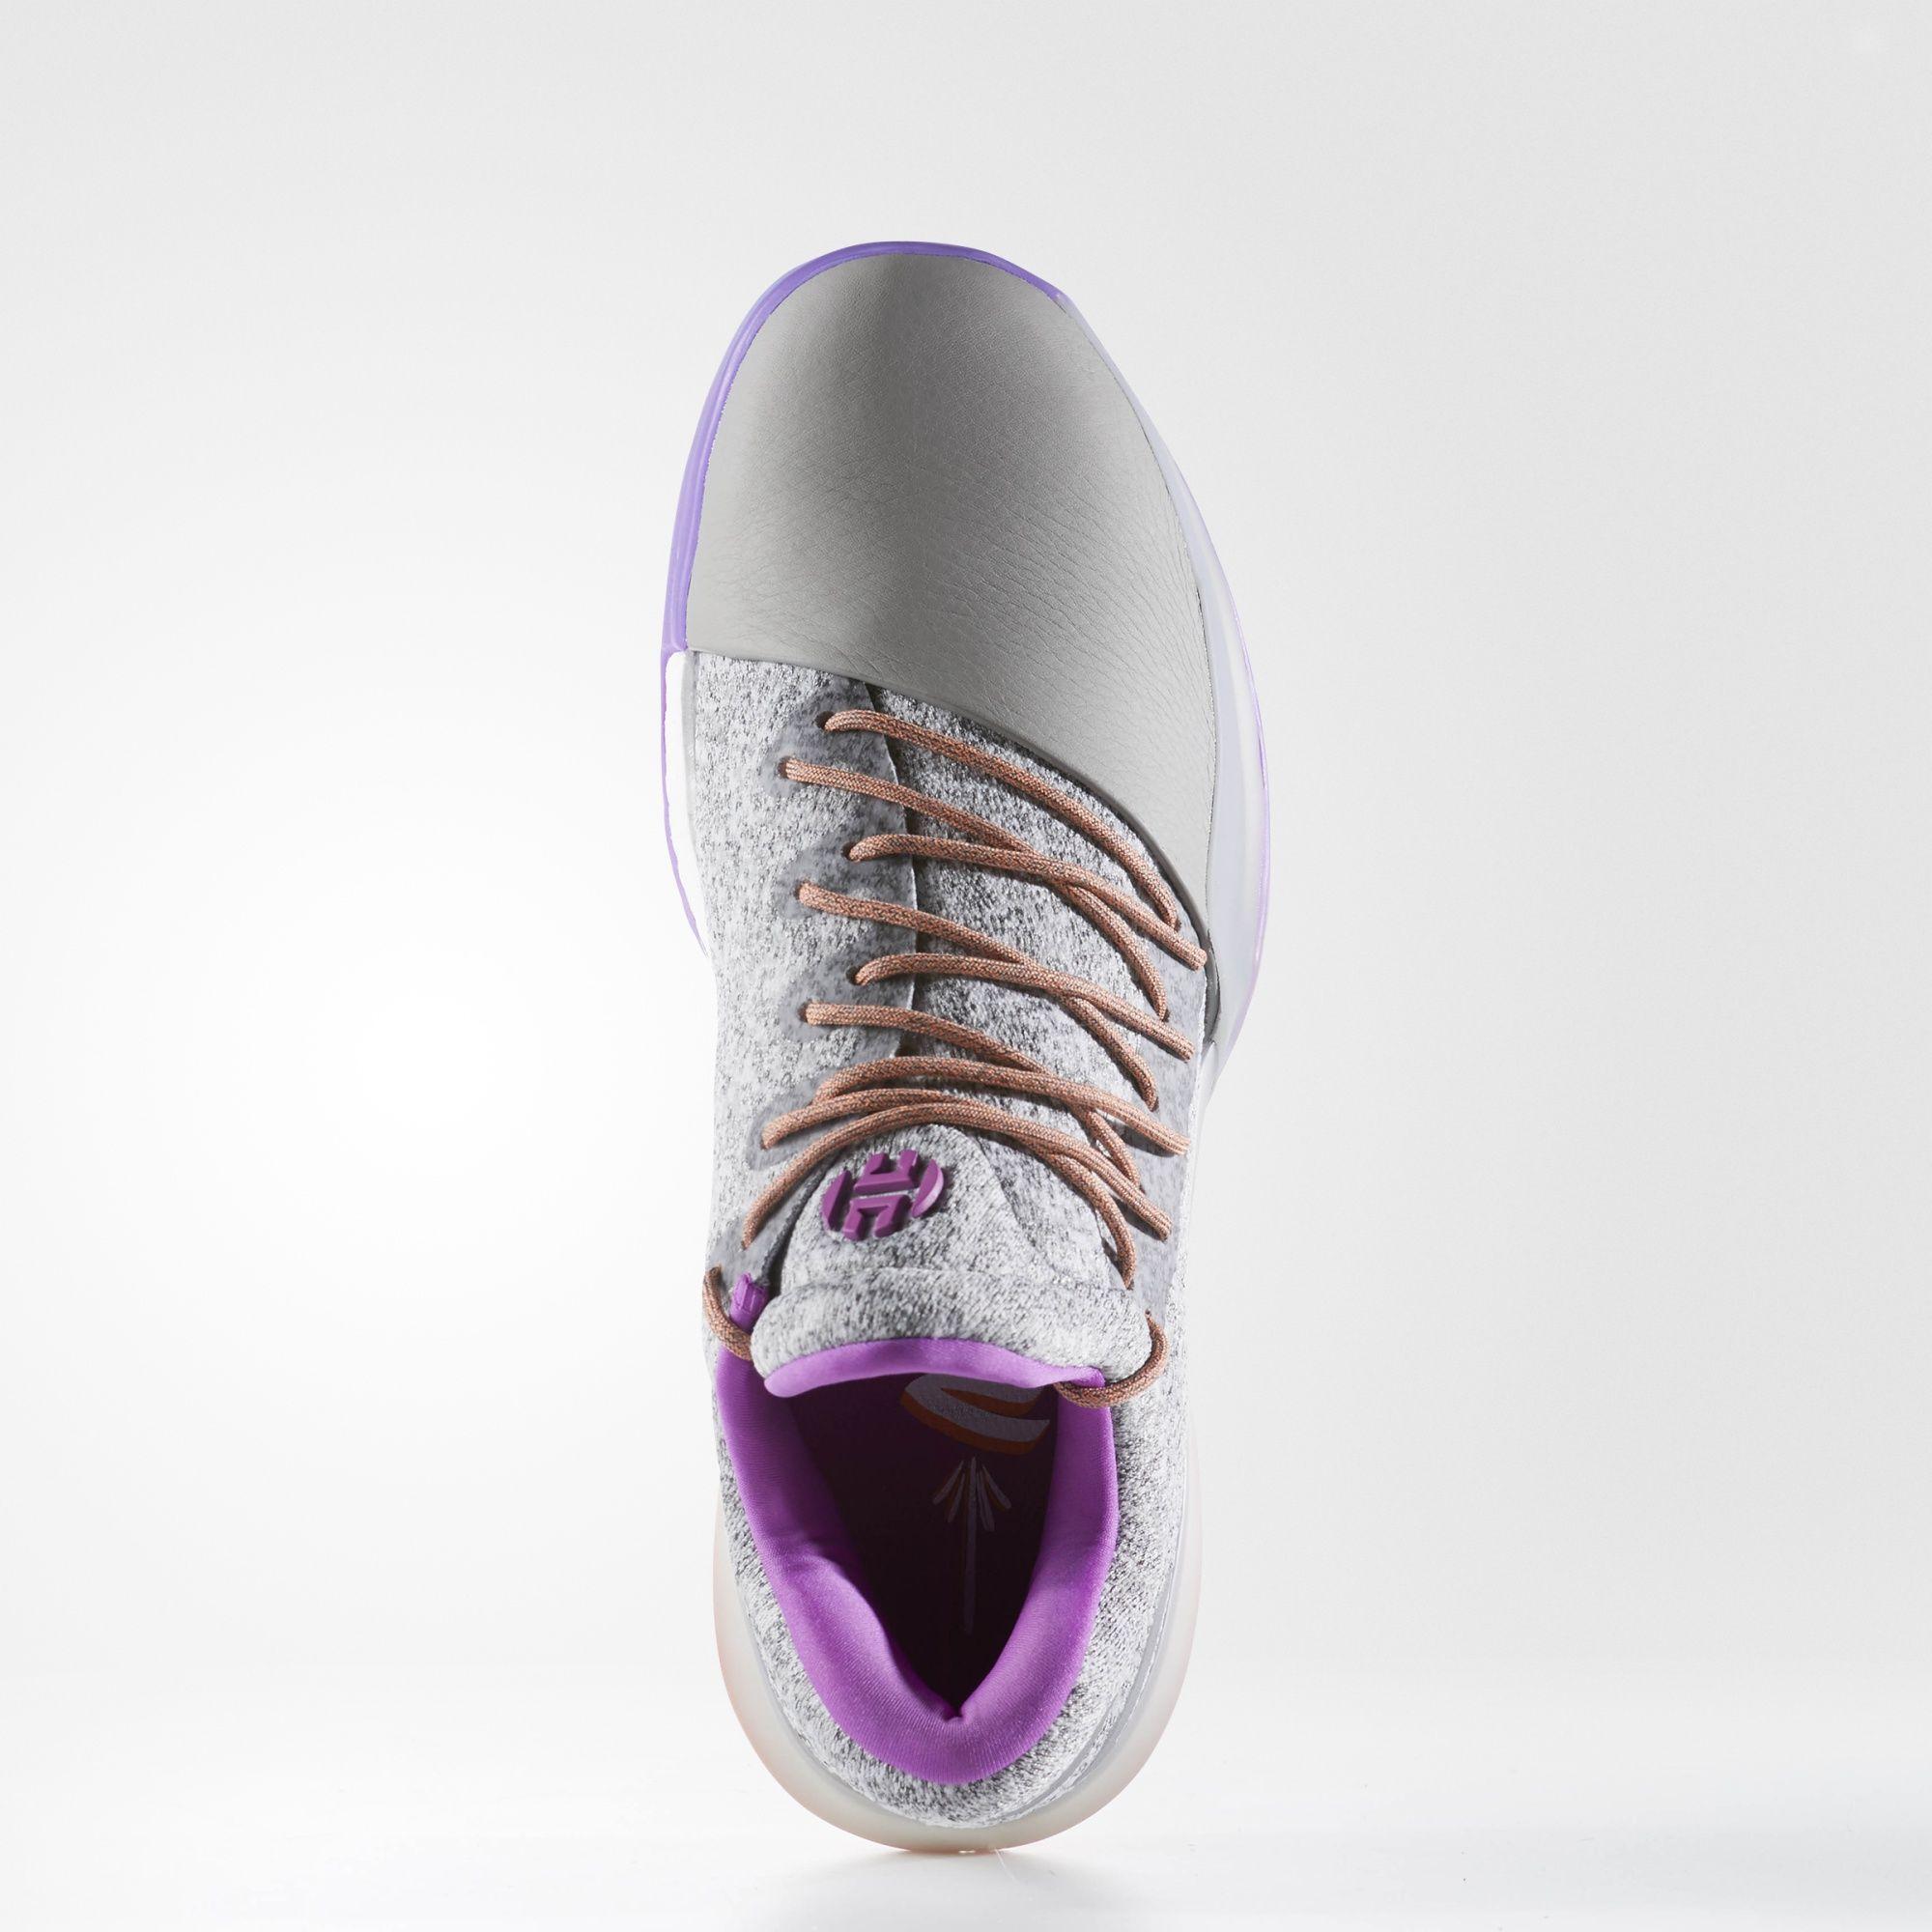 pick up 8f9f4 20ff6 adidas vert adidas 20ff6 harden 1 ec8e4f